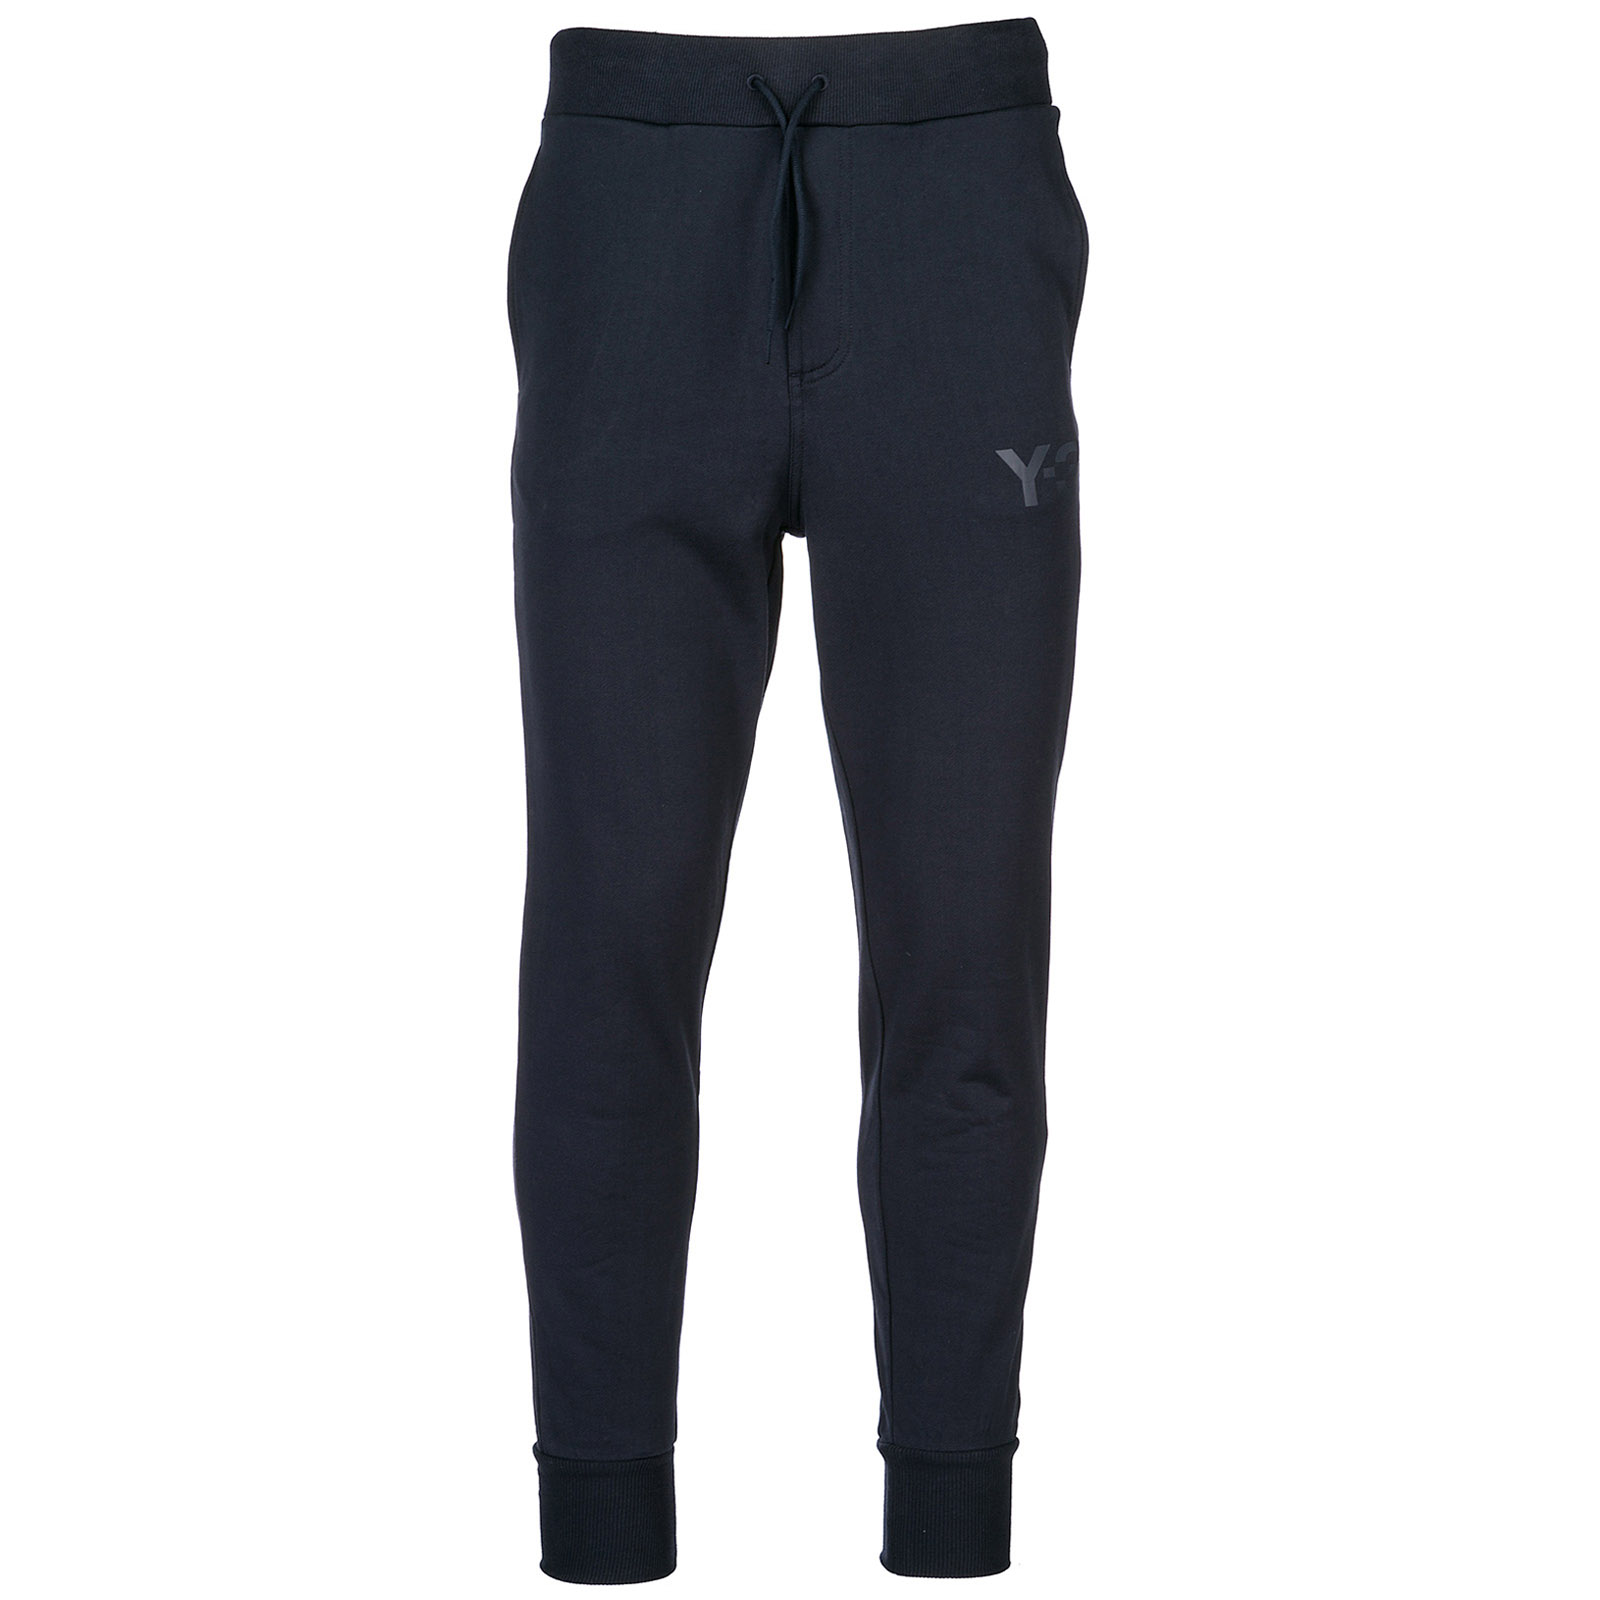 Pantaloni tuta uomo classic cuffed